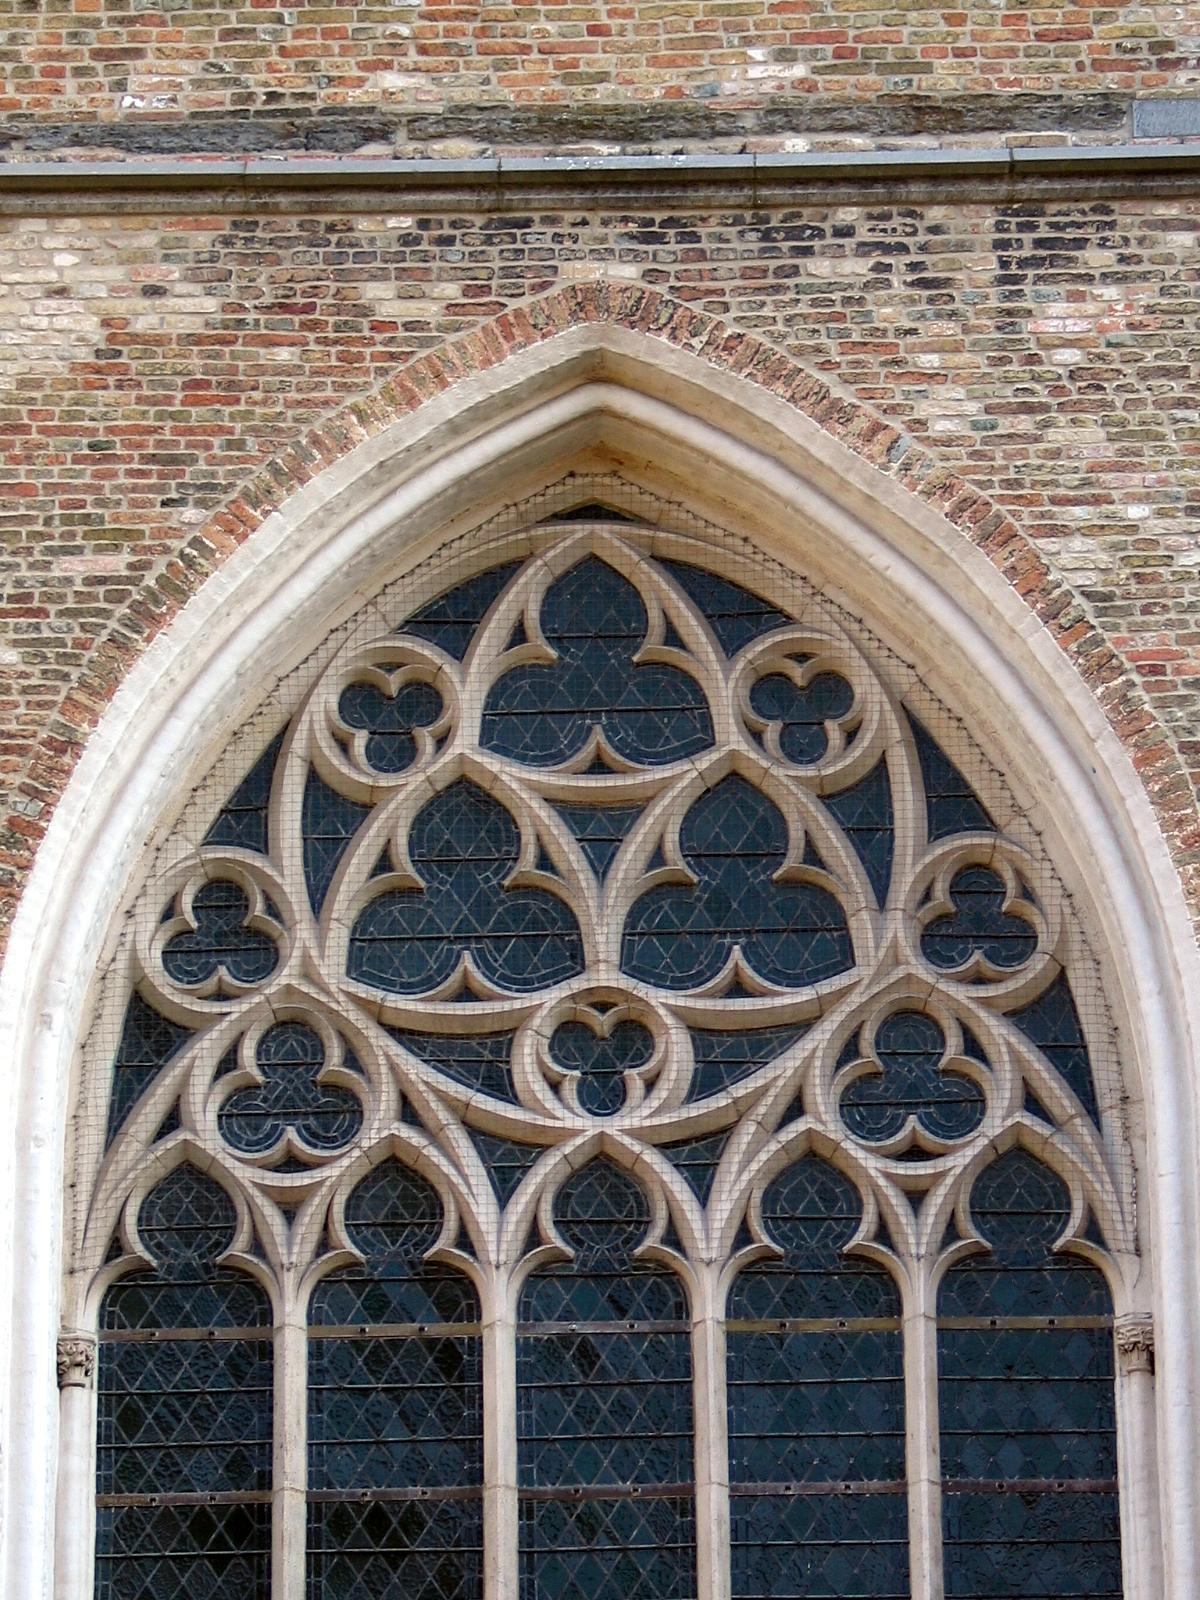 Reuleaux triangles on a window of Onze-Lieve-Vrouwekerk, Bruges 2.jpg